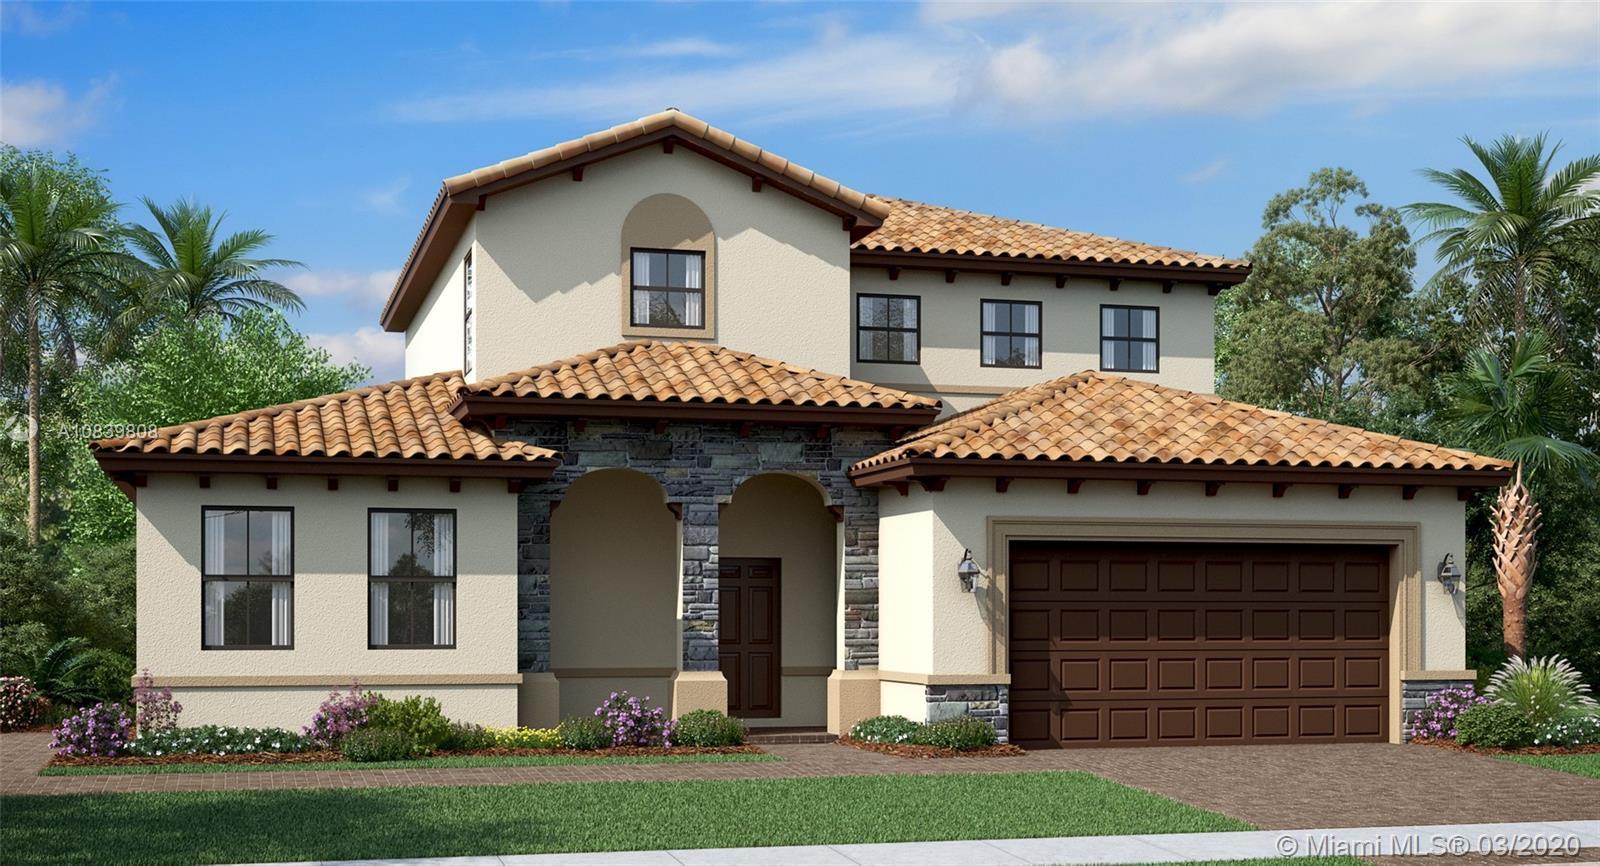 2567 SE 2 ST, Homestead, Florida 33033, 4 Bedrooms Bedrooms, ,4 BathroomsBathrooms,Residential,For Sale,2567 SE 2 ST,A10839808